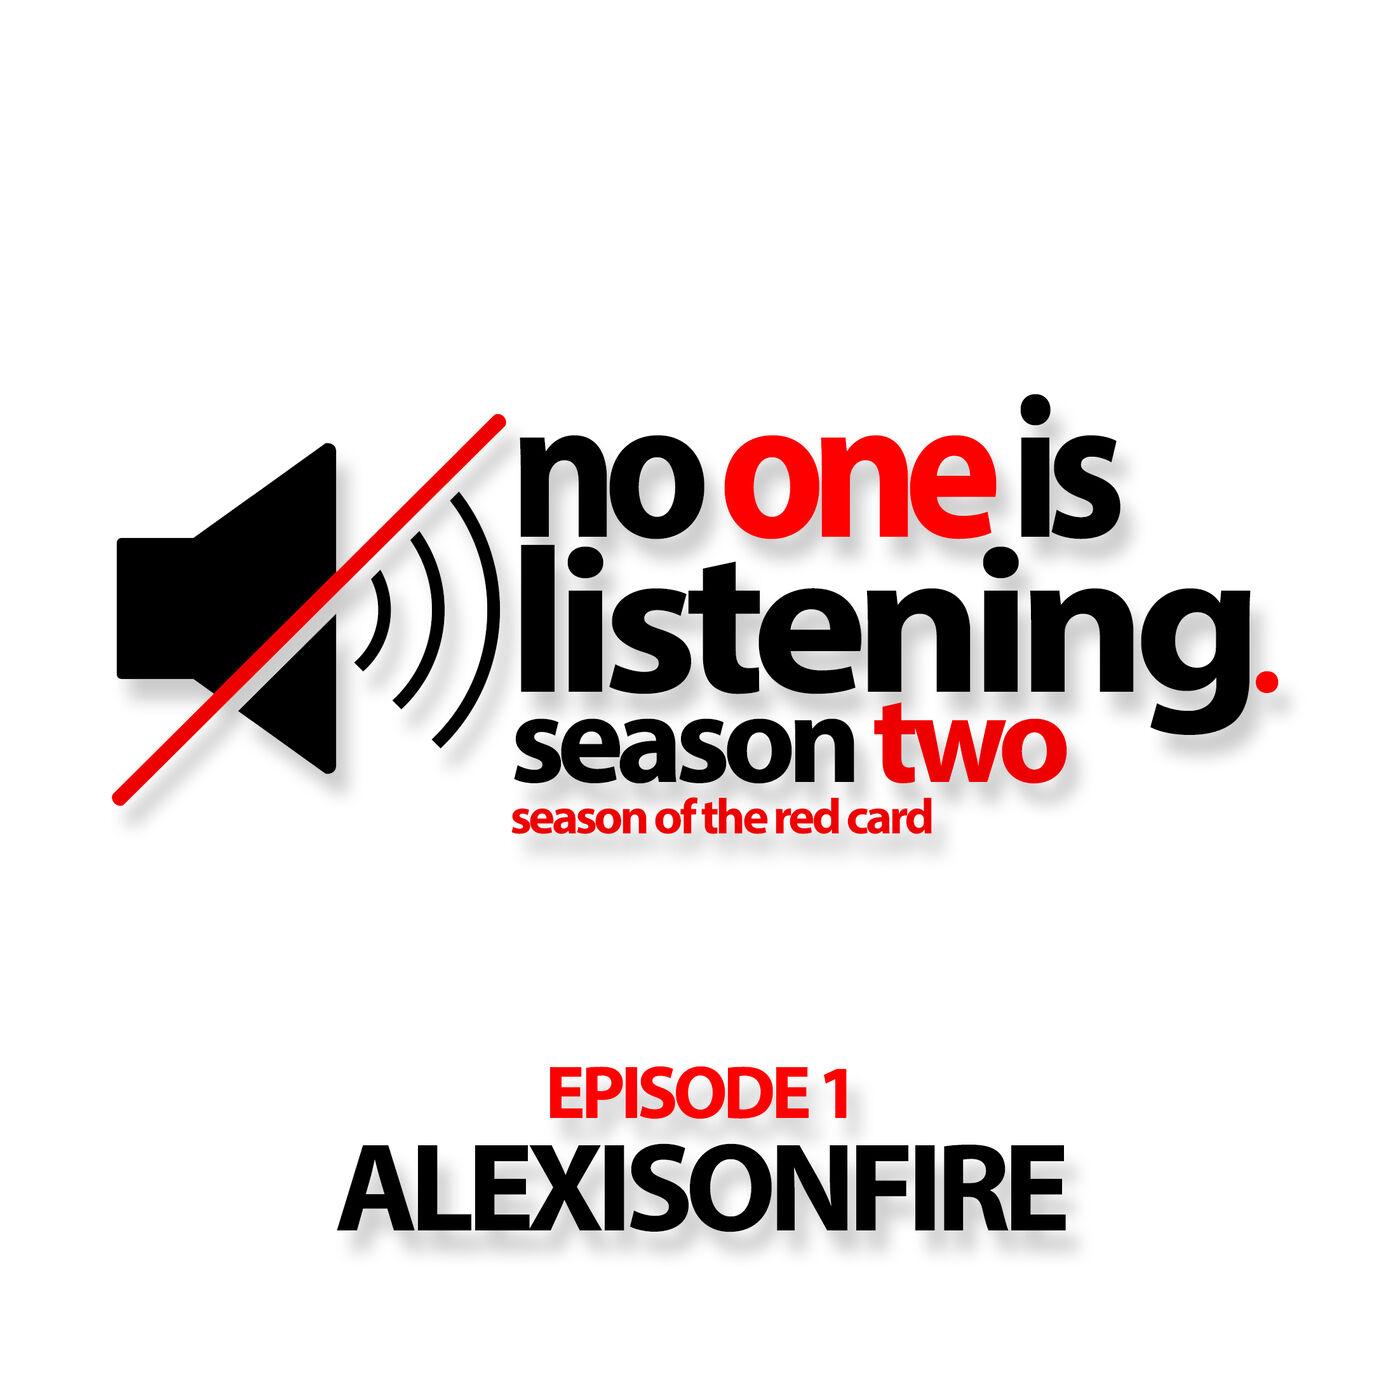 S2E1 Alexisonfire